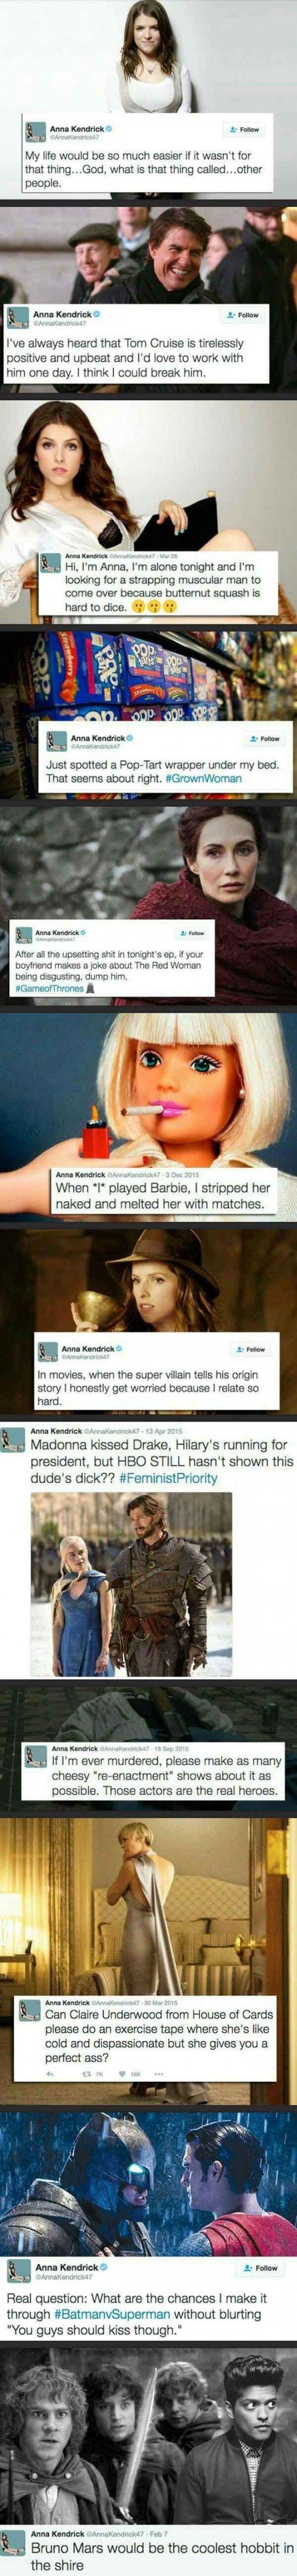 Some Favorite Anna Kendrick Tweets